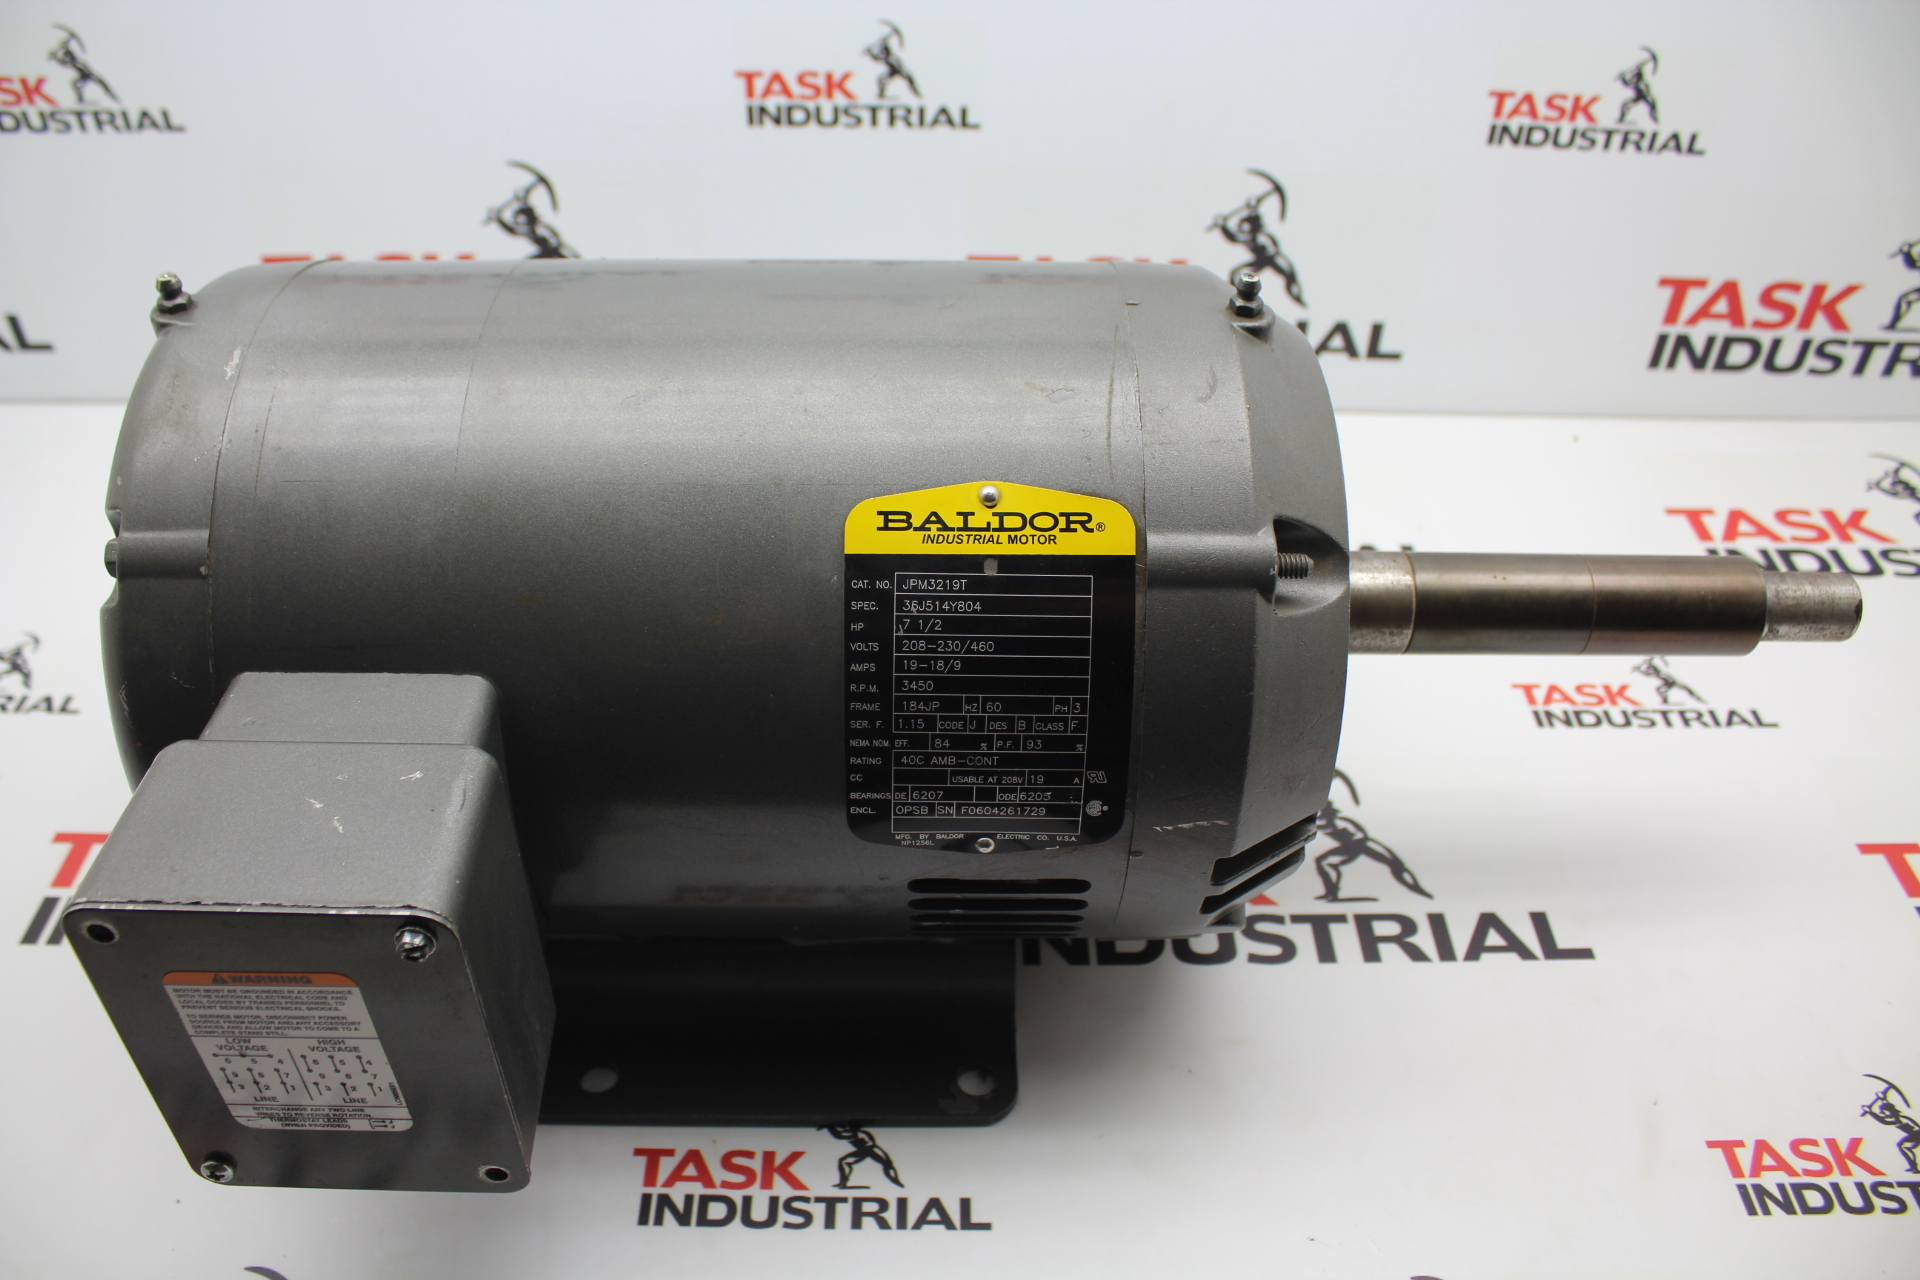 Baldor Archives Task Surplus 3 Hp Motor Wiring Diagram Tags This Is Jpm3219t 75 Rpm 3450 Frame 184jp Ph